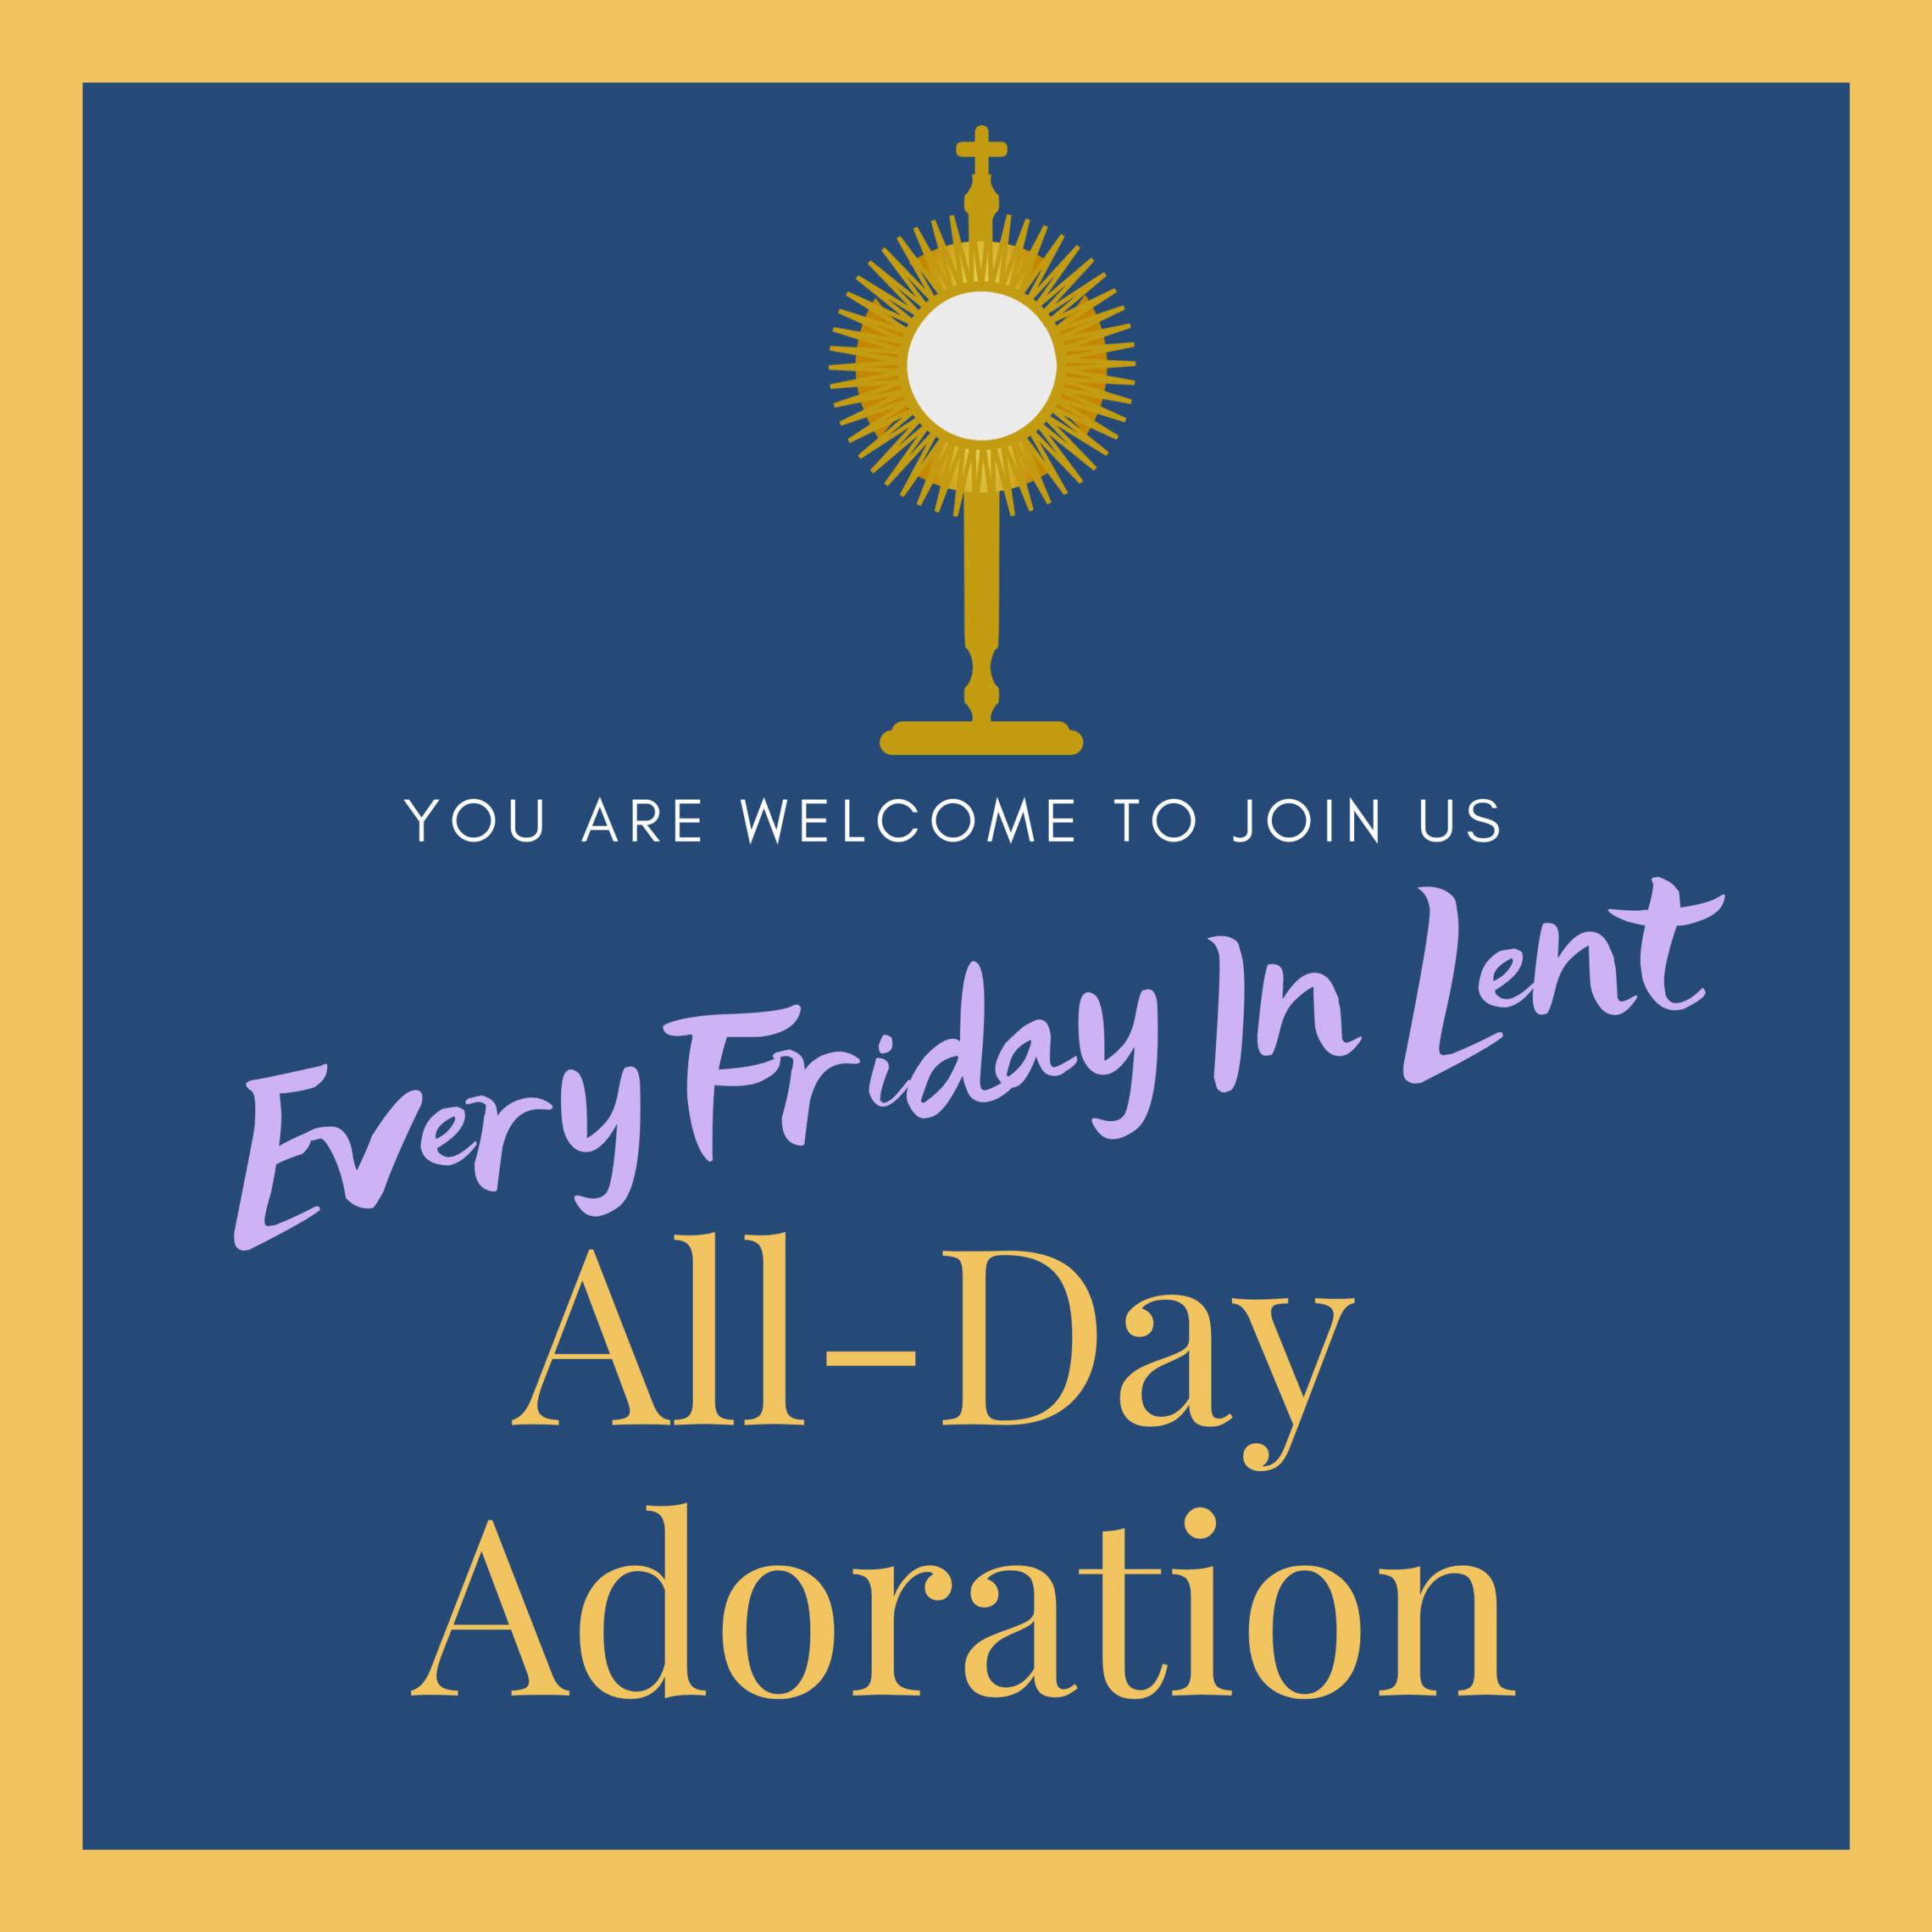 Lent Fridays